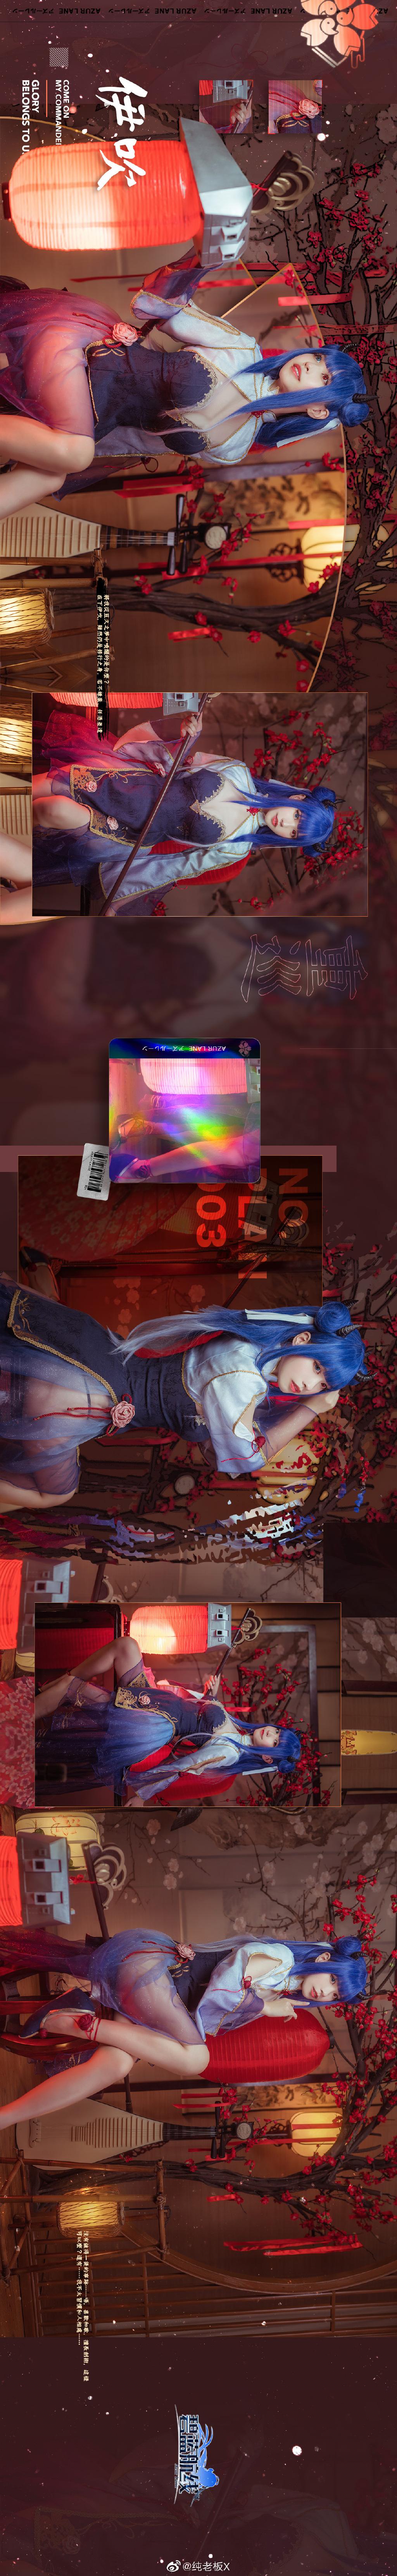 [COS]碧蓝航线  cosplay伊吹 @O纯老板X COSPLAY-第1张